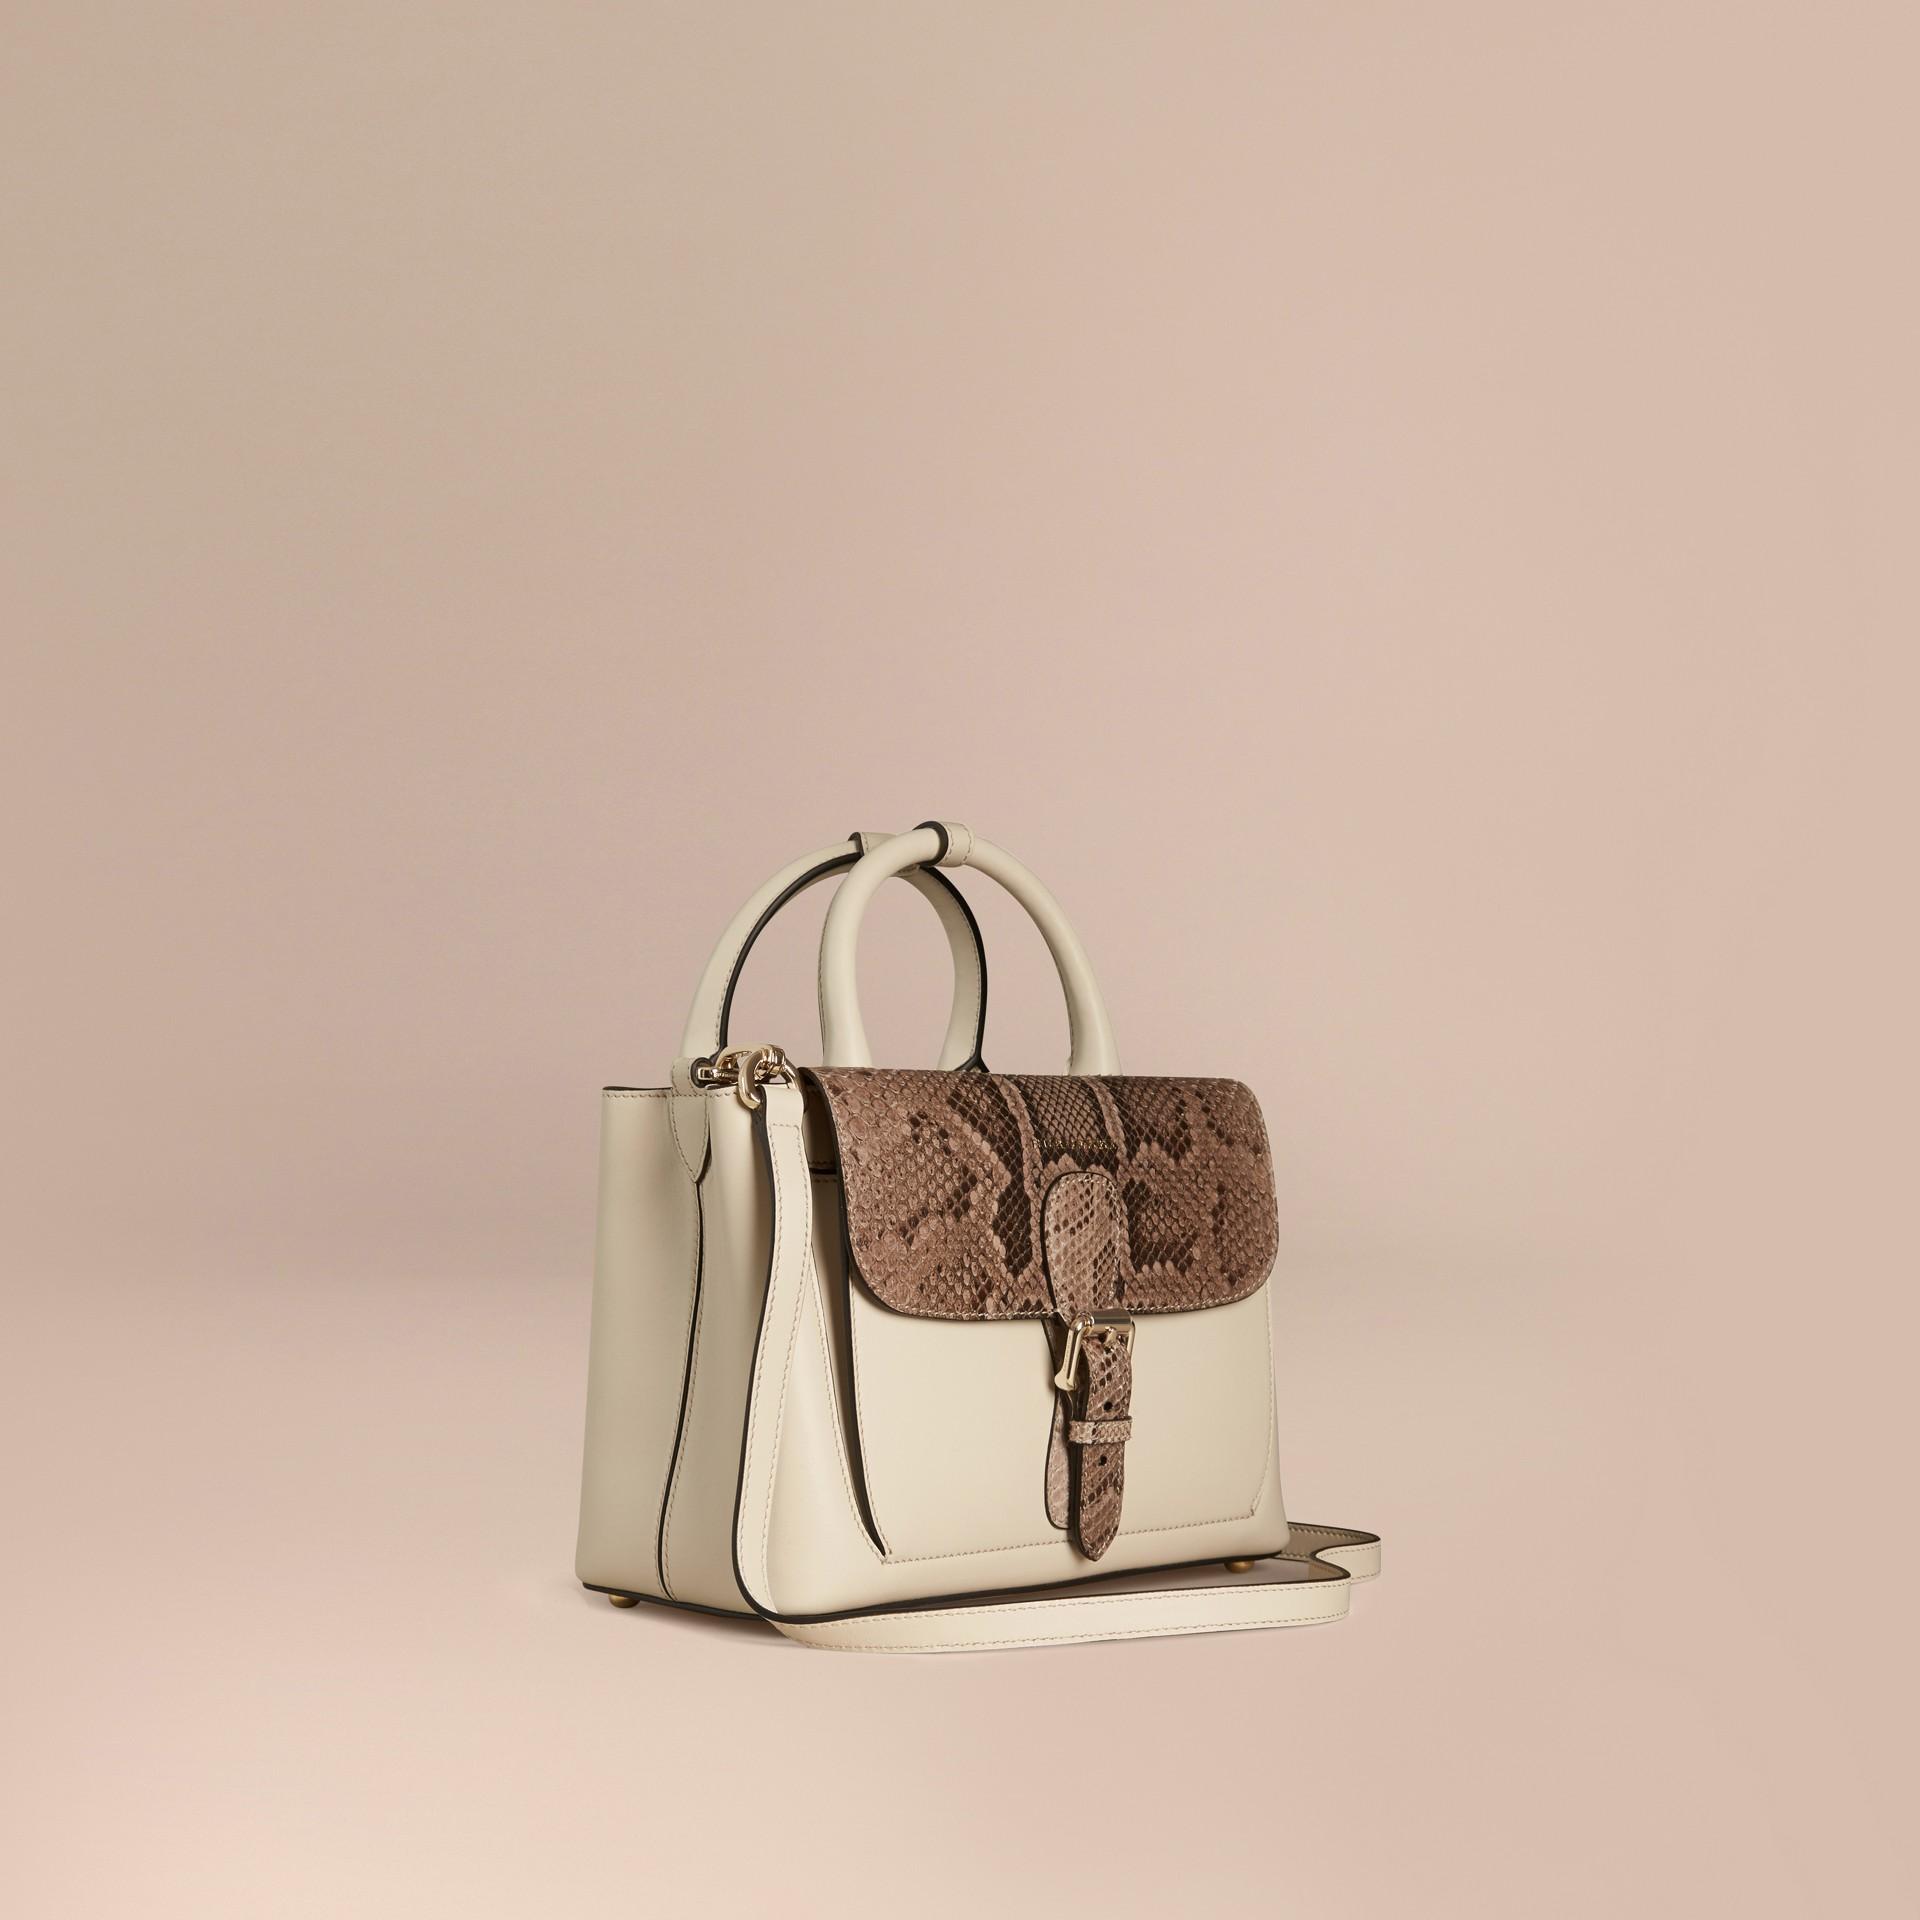 Steinfarben The Small Saddle Bag aus Glattleder und Pythonleder - Galerie-Bild 1